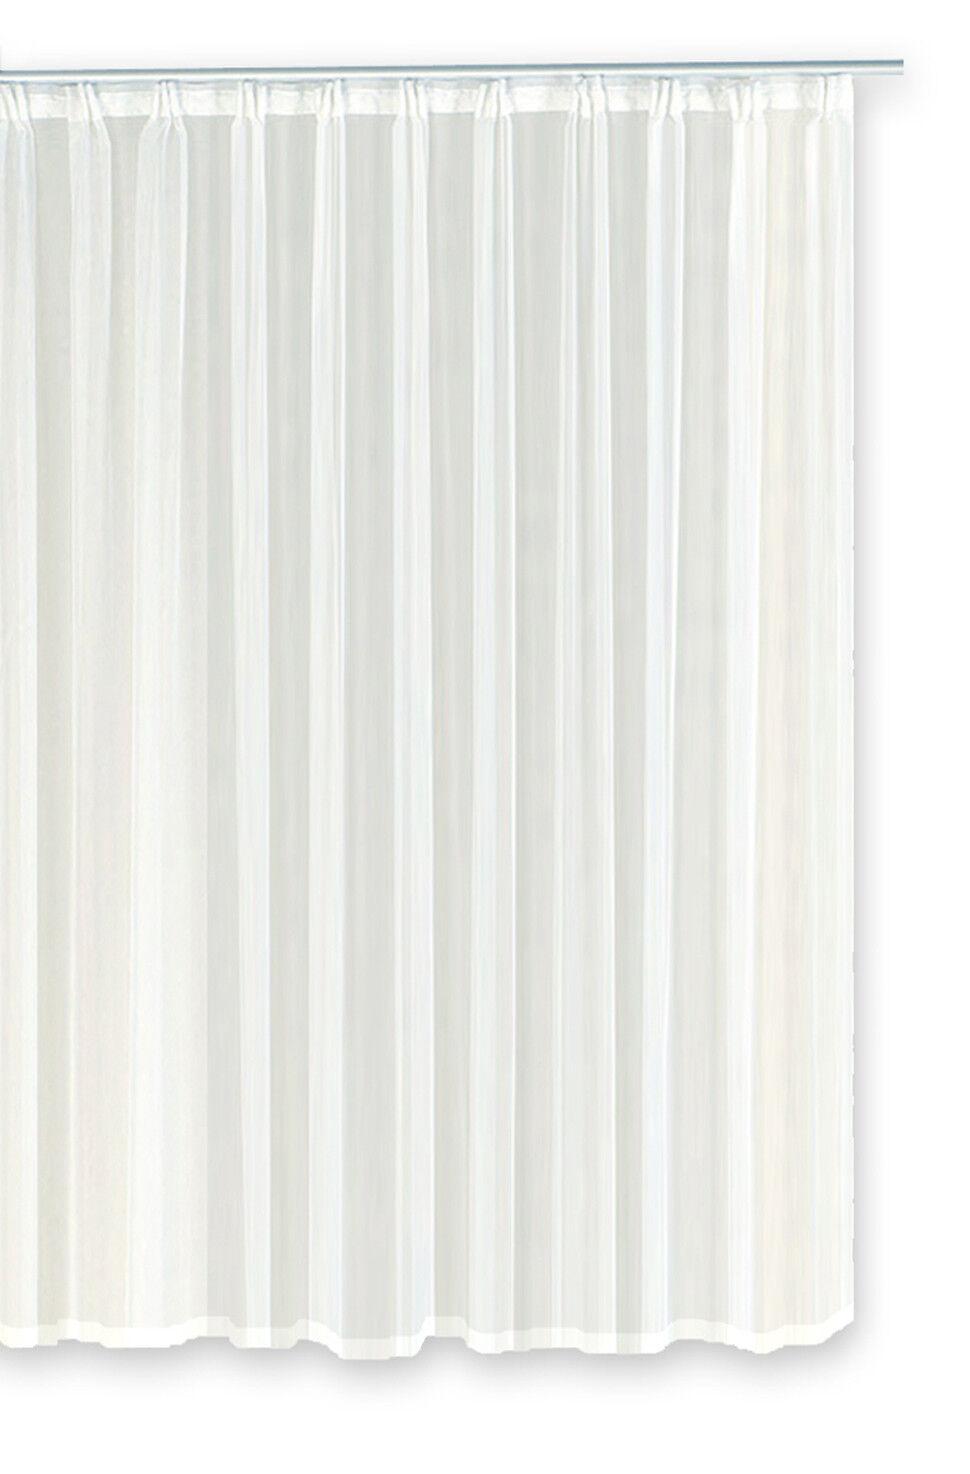 Voile Dekoschal Rideau Rideau Rideau émotion Blanc Organza Rideau kr uselband classique 107c5a